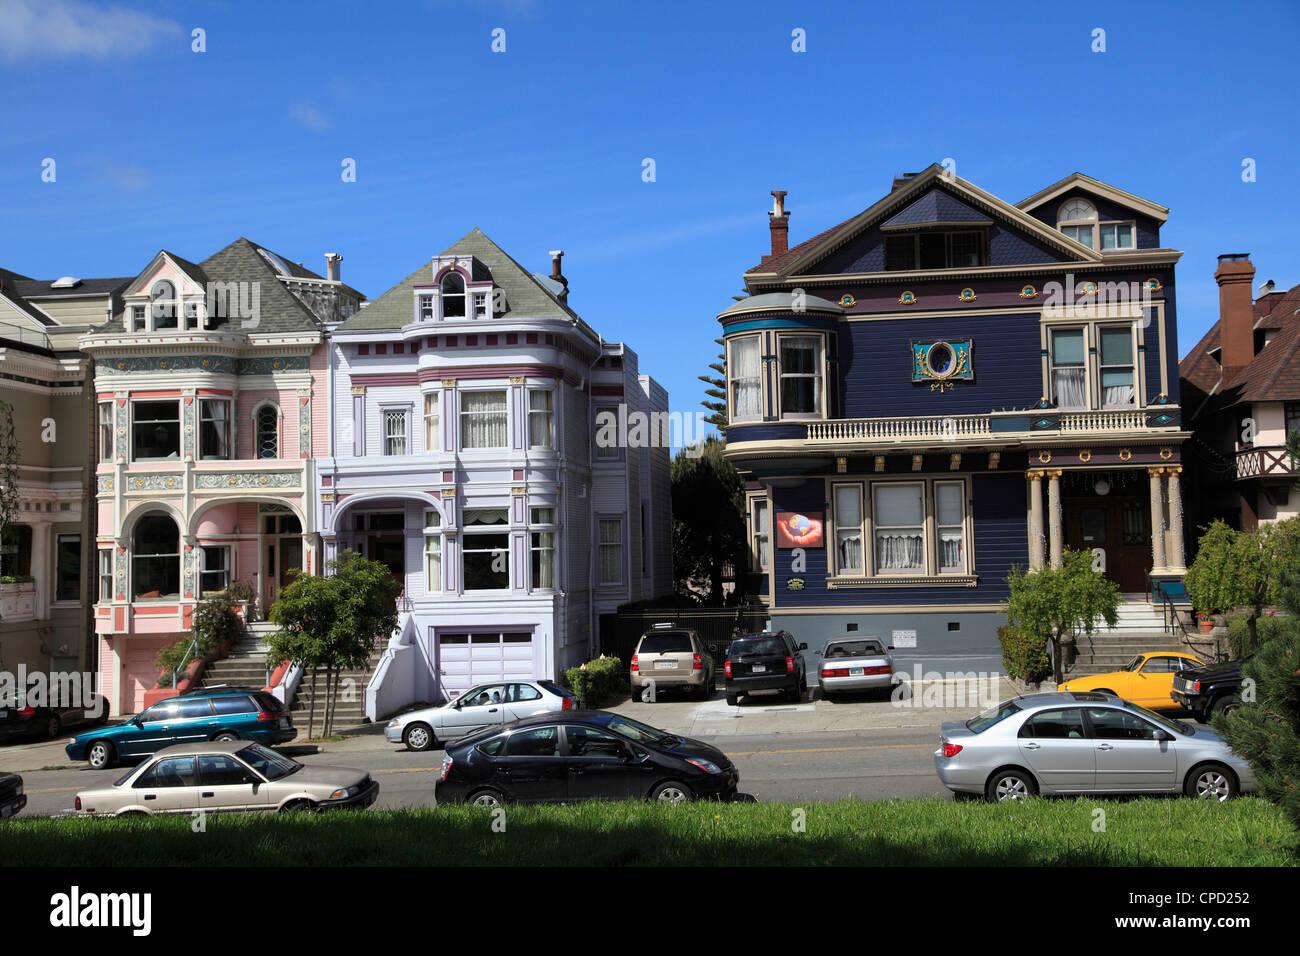 Viktorianische Architektur, Painted Ladies, Alamo Square, San Francisco, California, Vereinigte Staaten von Amerika, Stockbild